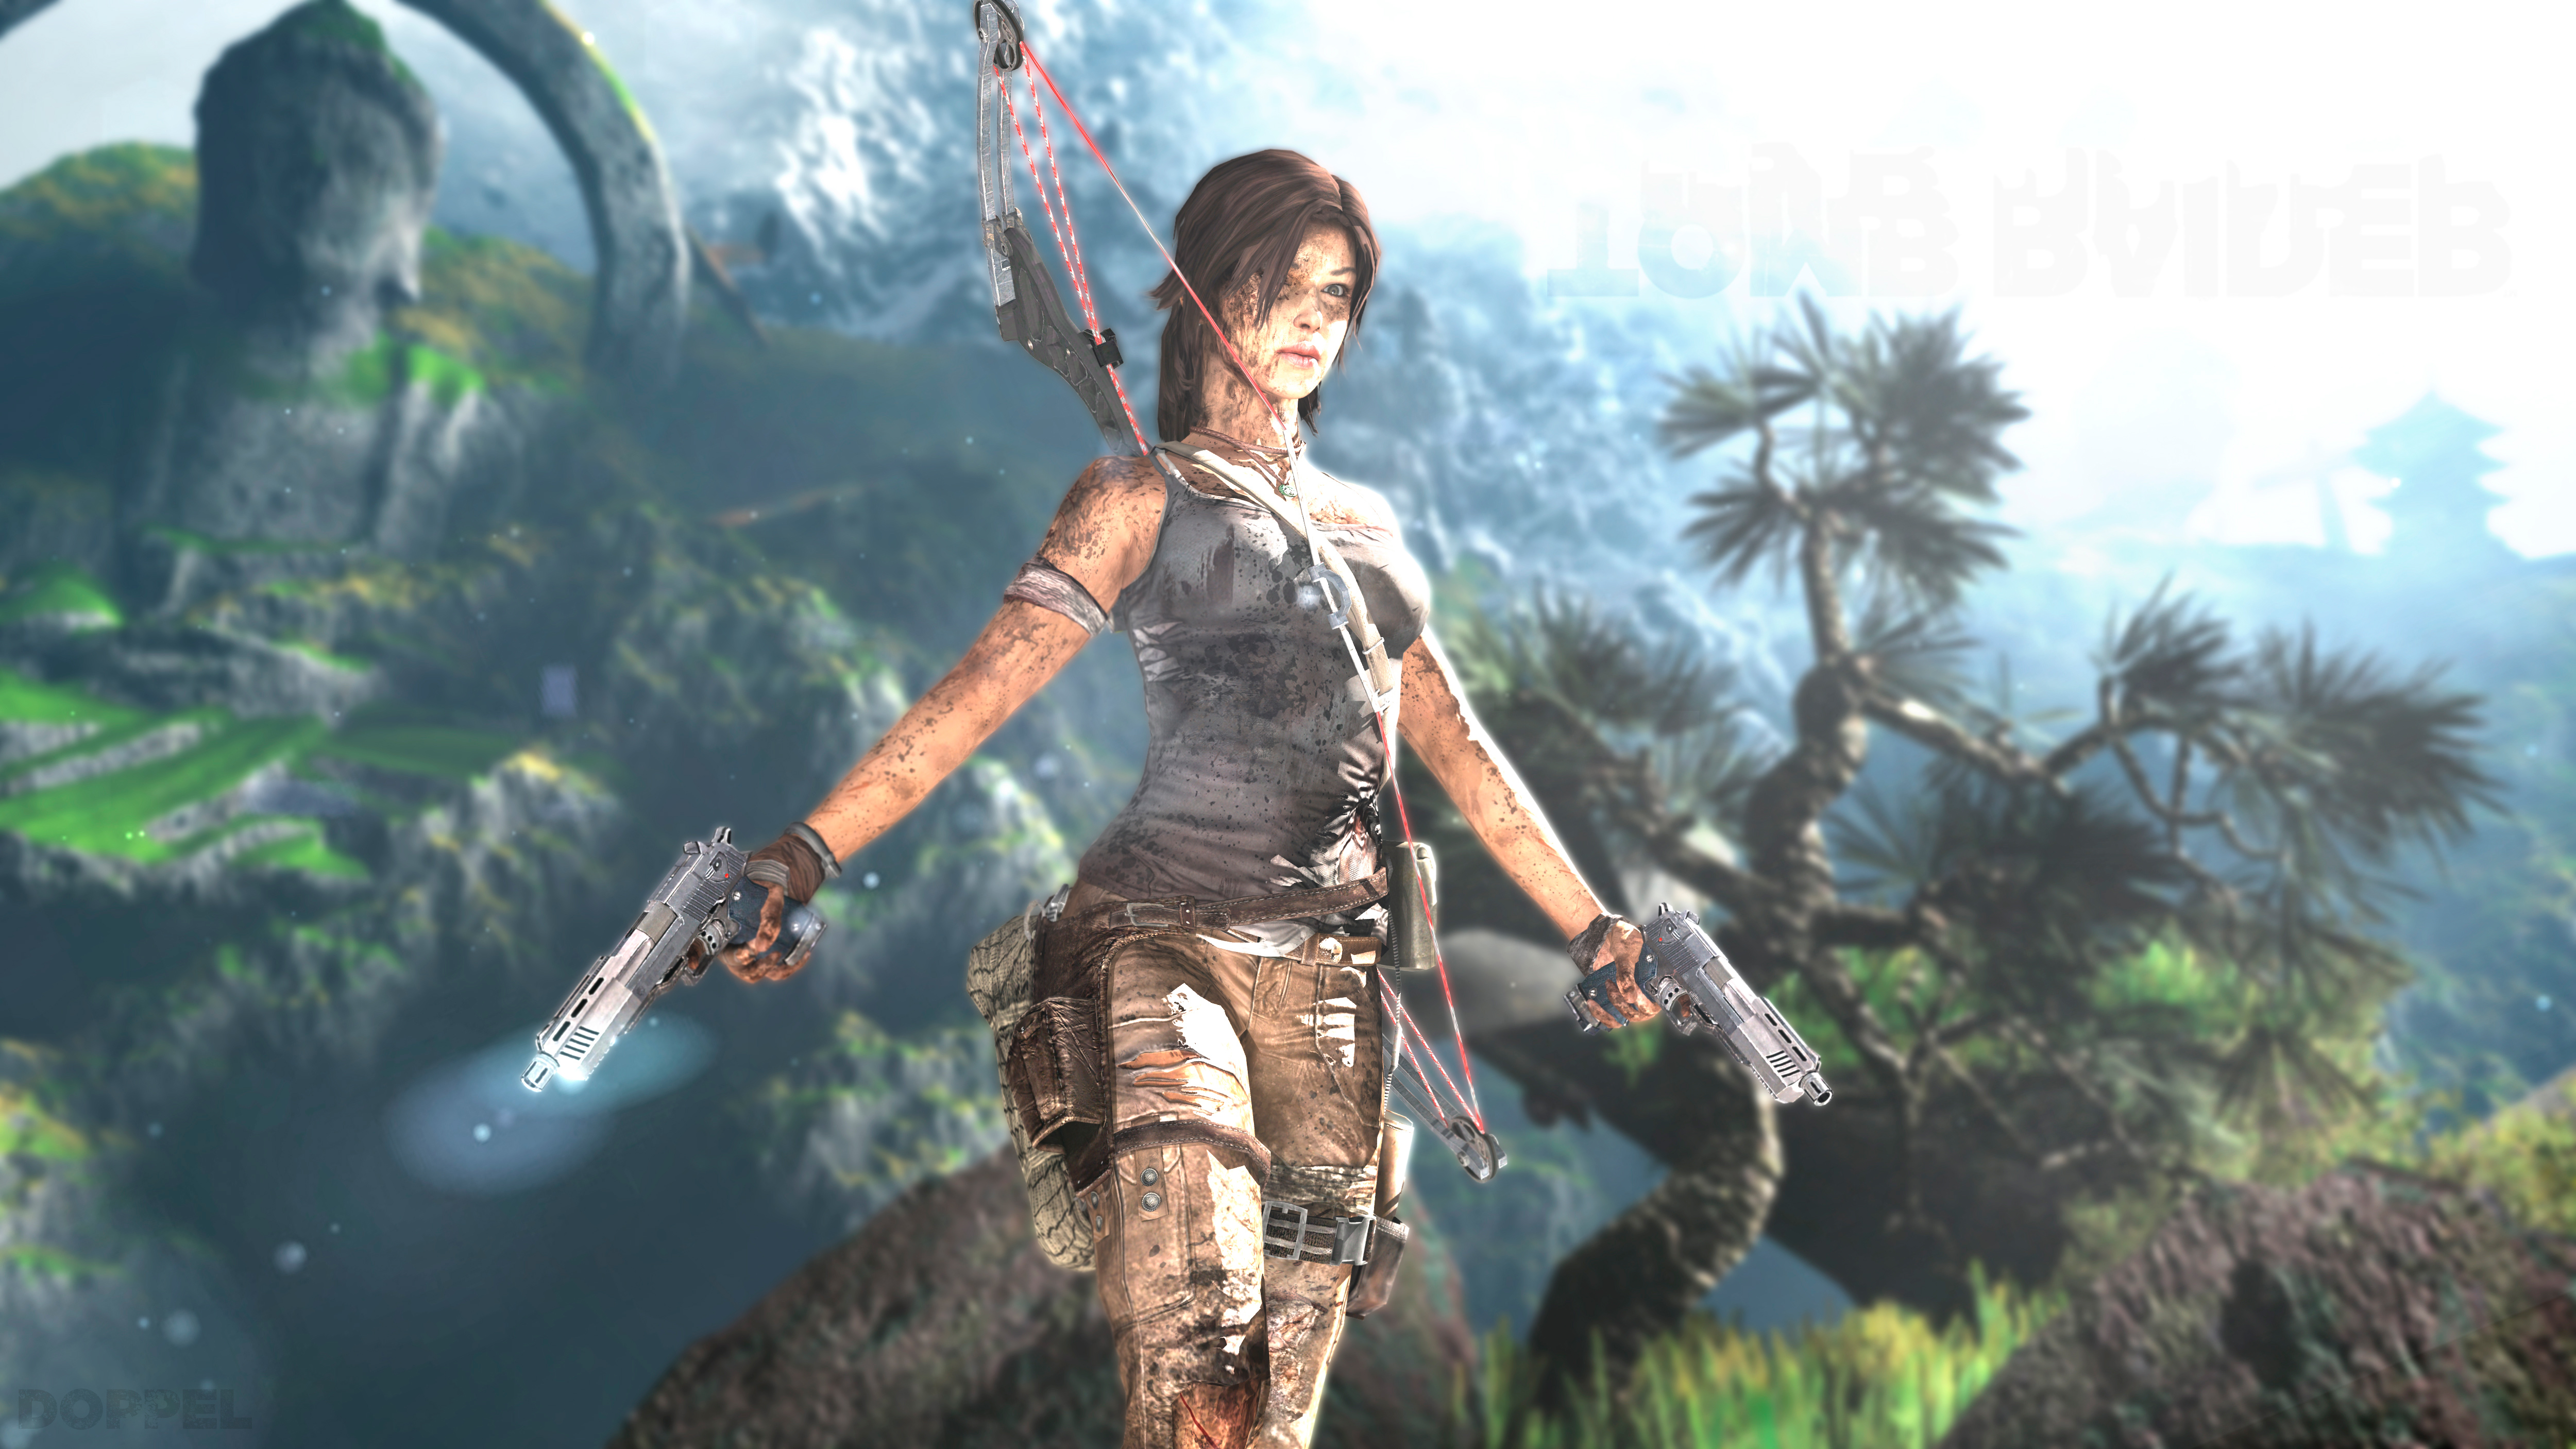 7680x4320 Lara Croft 8k Artwork 8k Hd 4k Wallpapers: 3840x2160 5k Tomb Raider 4k HD 4k Wallpapers, Images